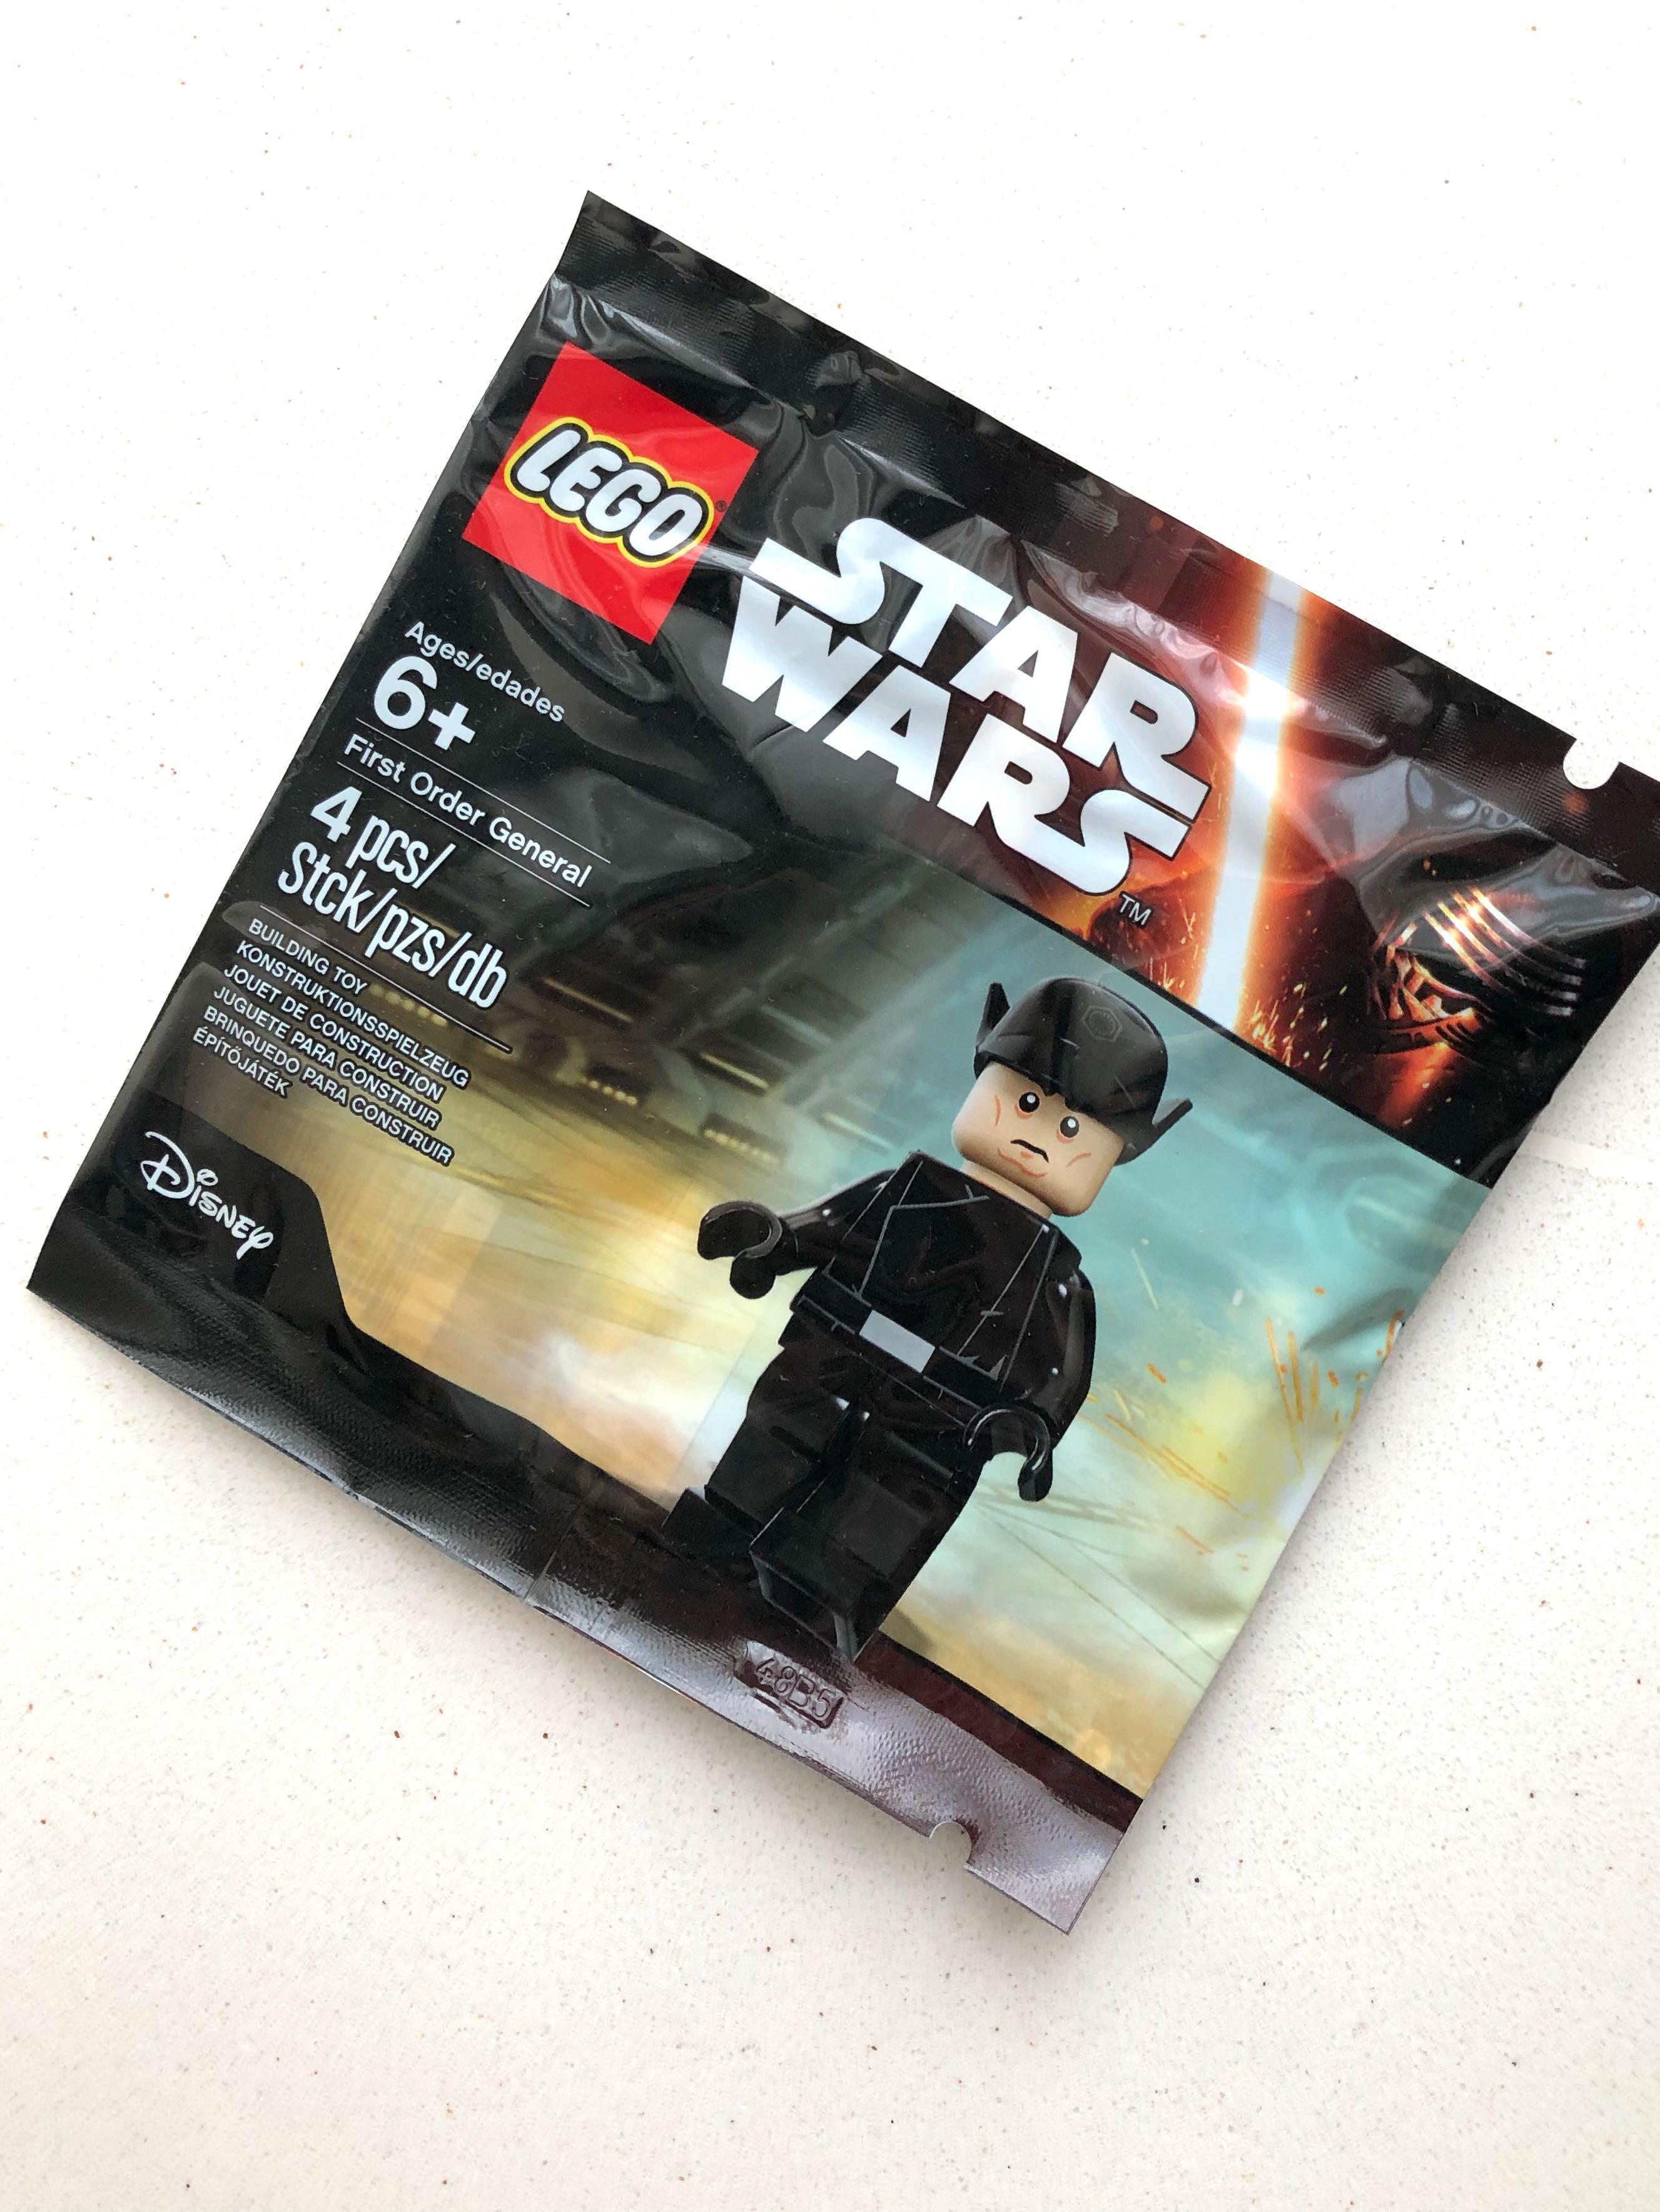 Lego Polybag Starwars First Order General